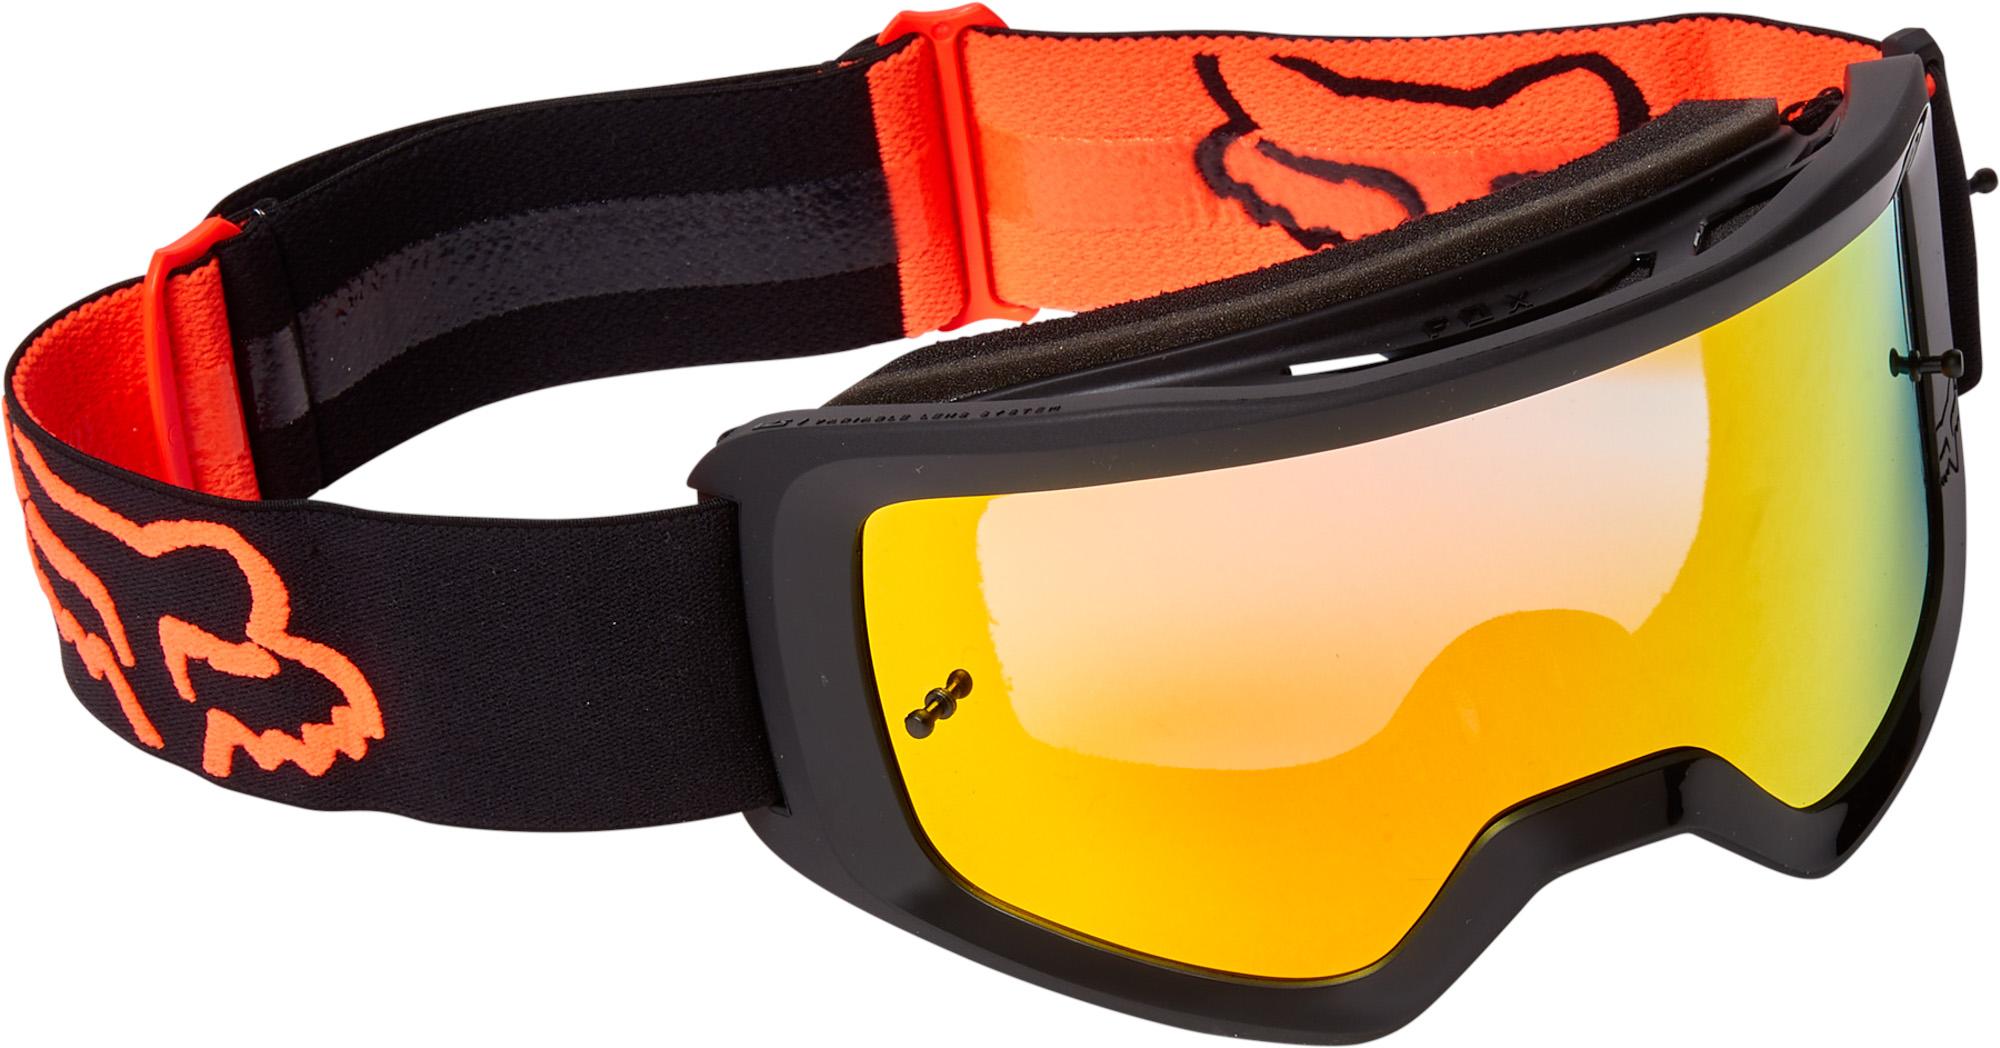 FOX Main Stray Goggle - Spark - OS, BLACK/ORANGE MX22